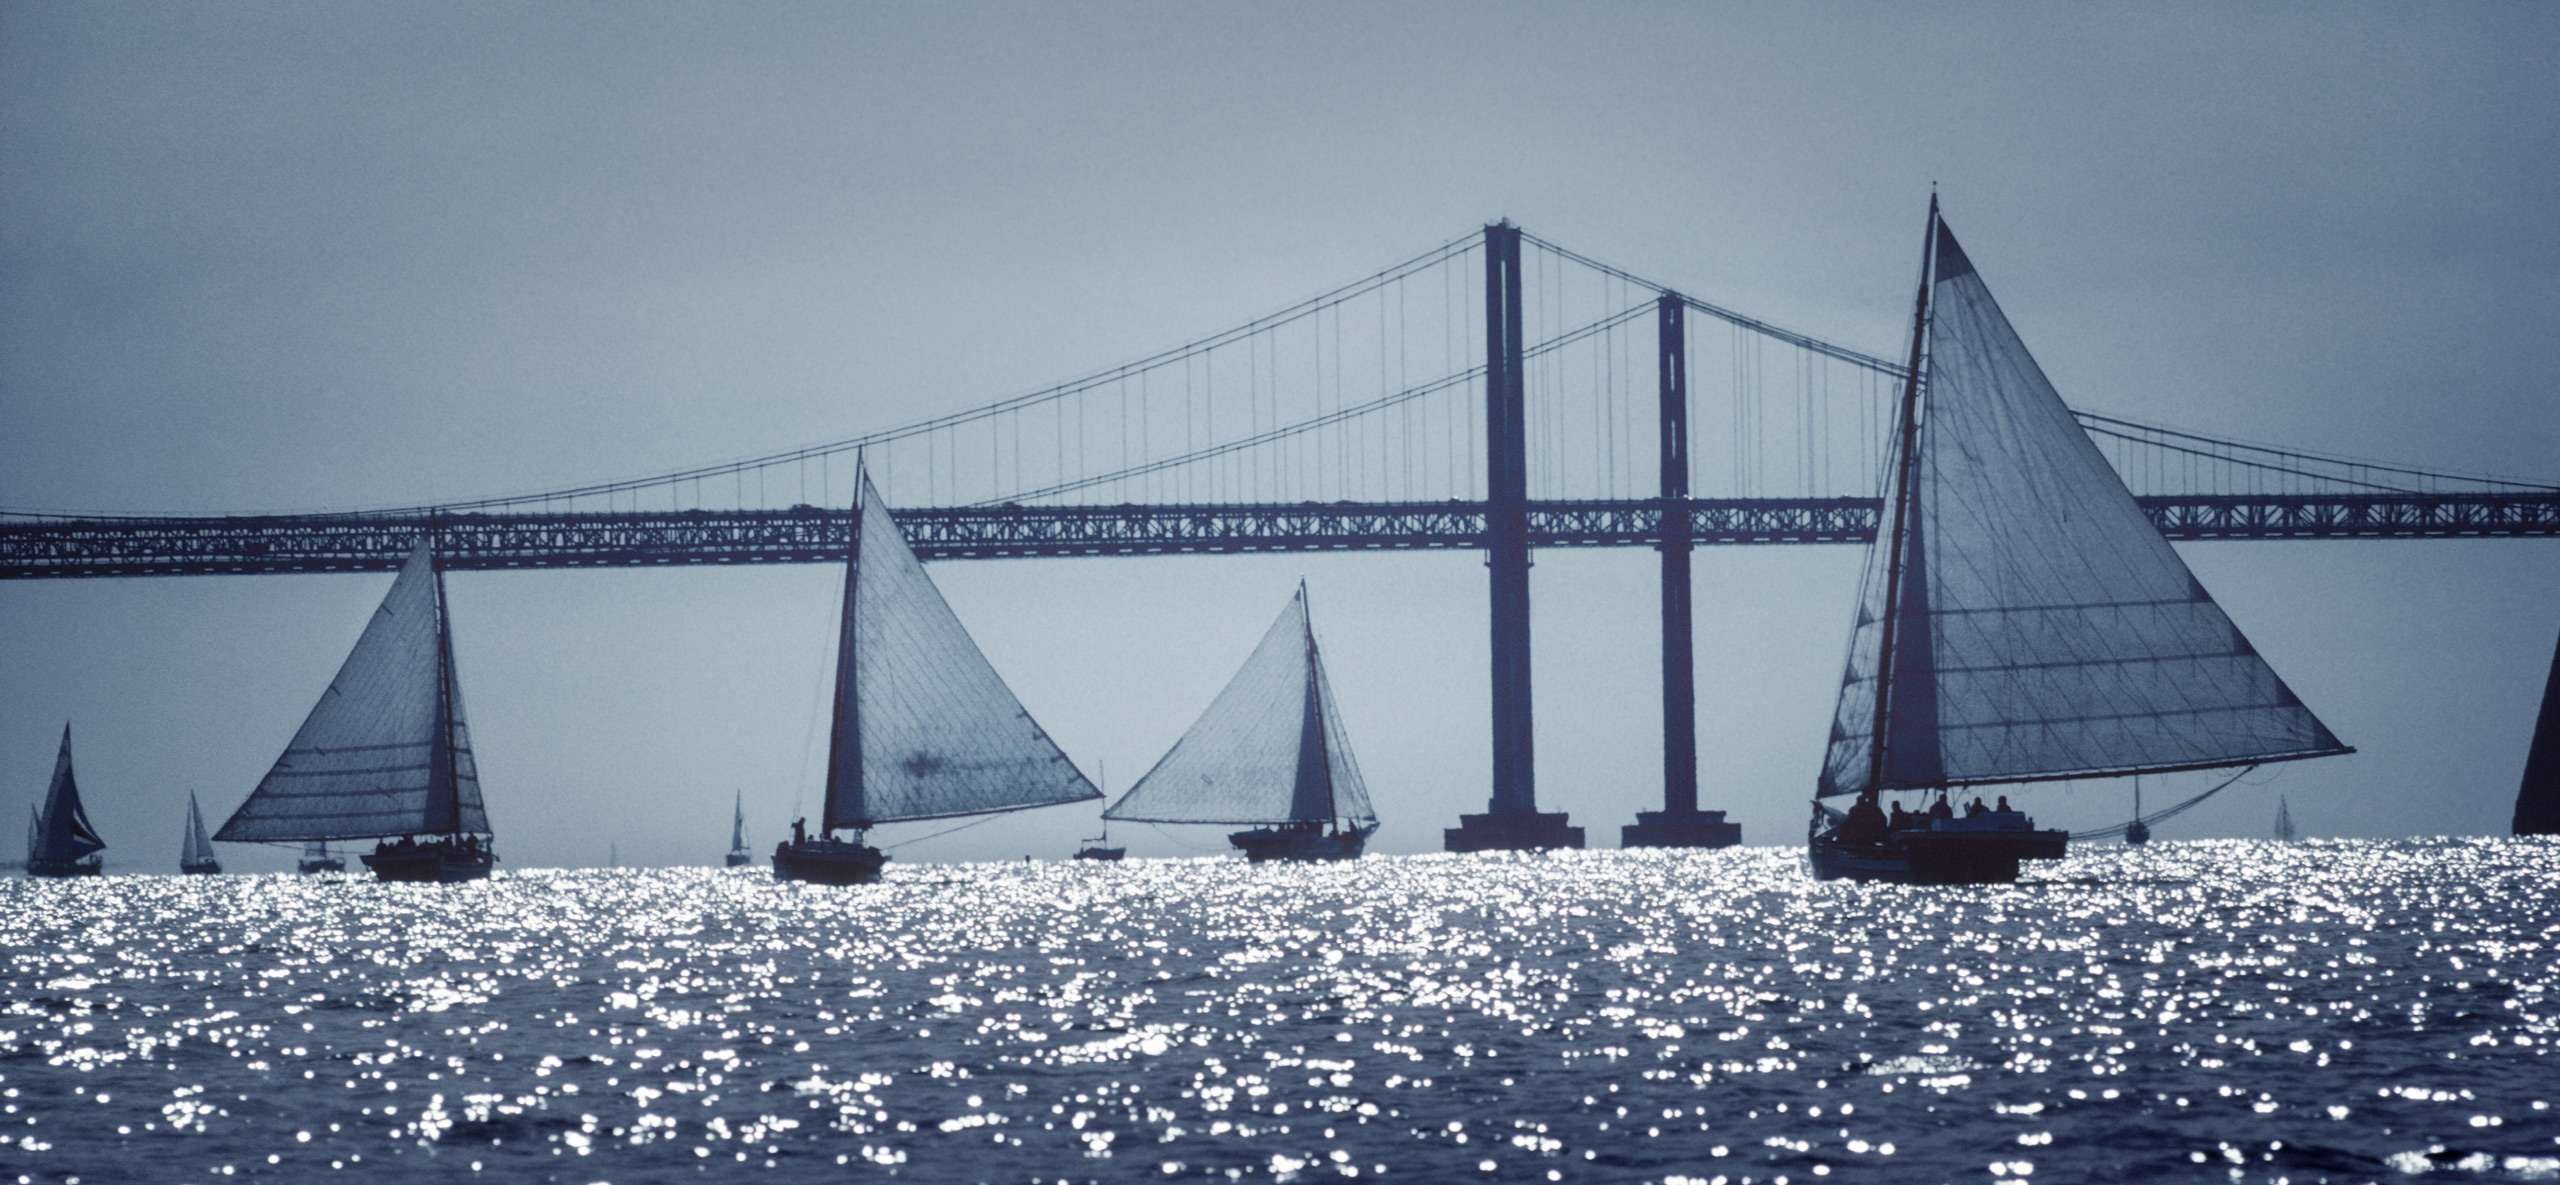 PORTFOLIO - Sailing - Chesapeake #14   PCG136